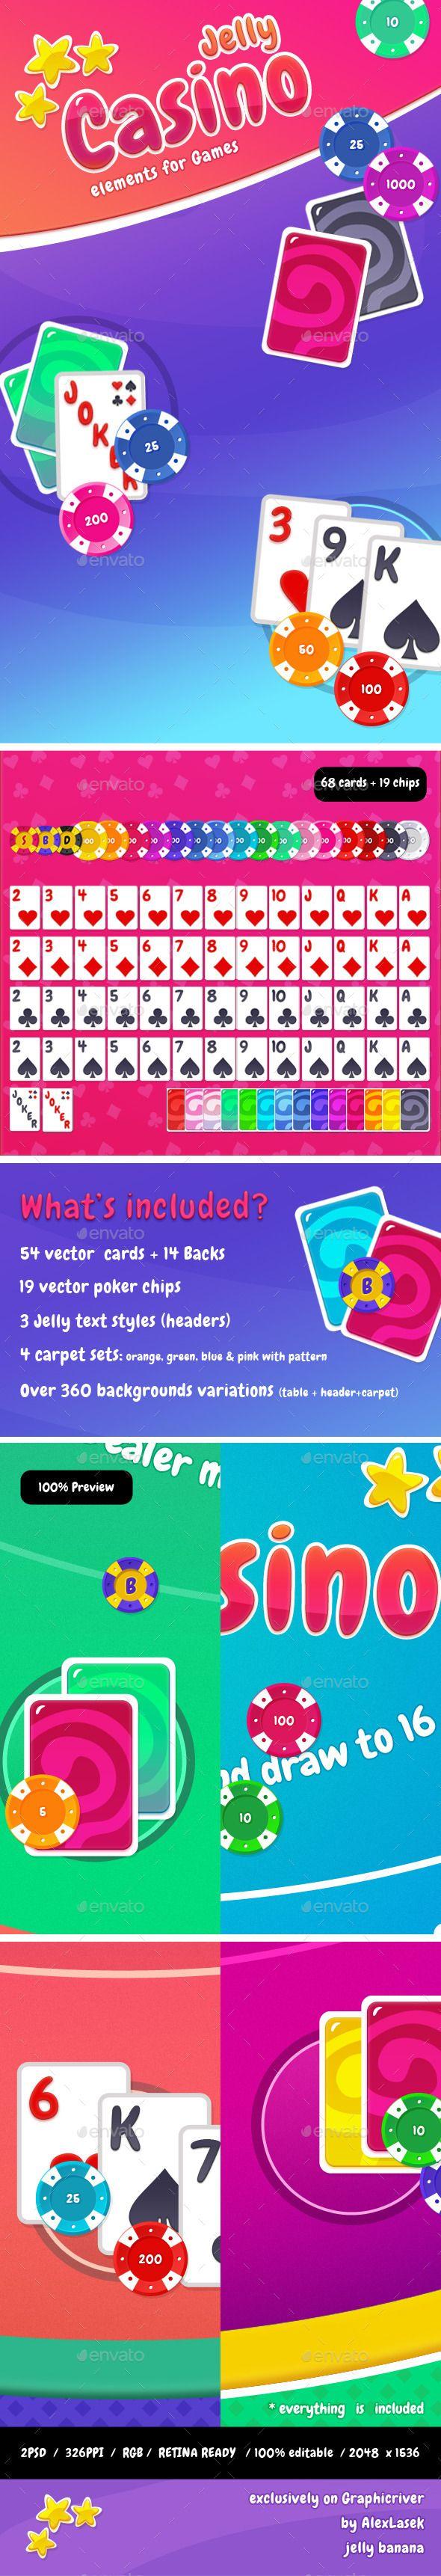 Cartoon Casino Card Games Kit  - Game Kits Game Assets